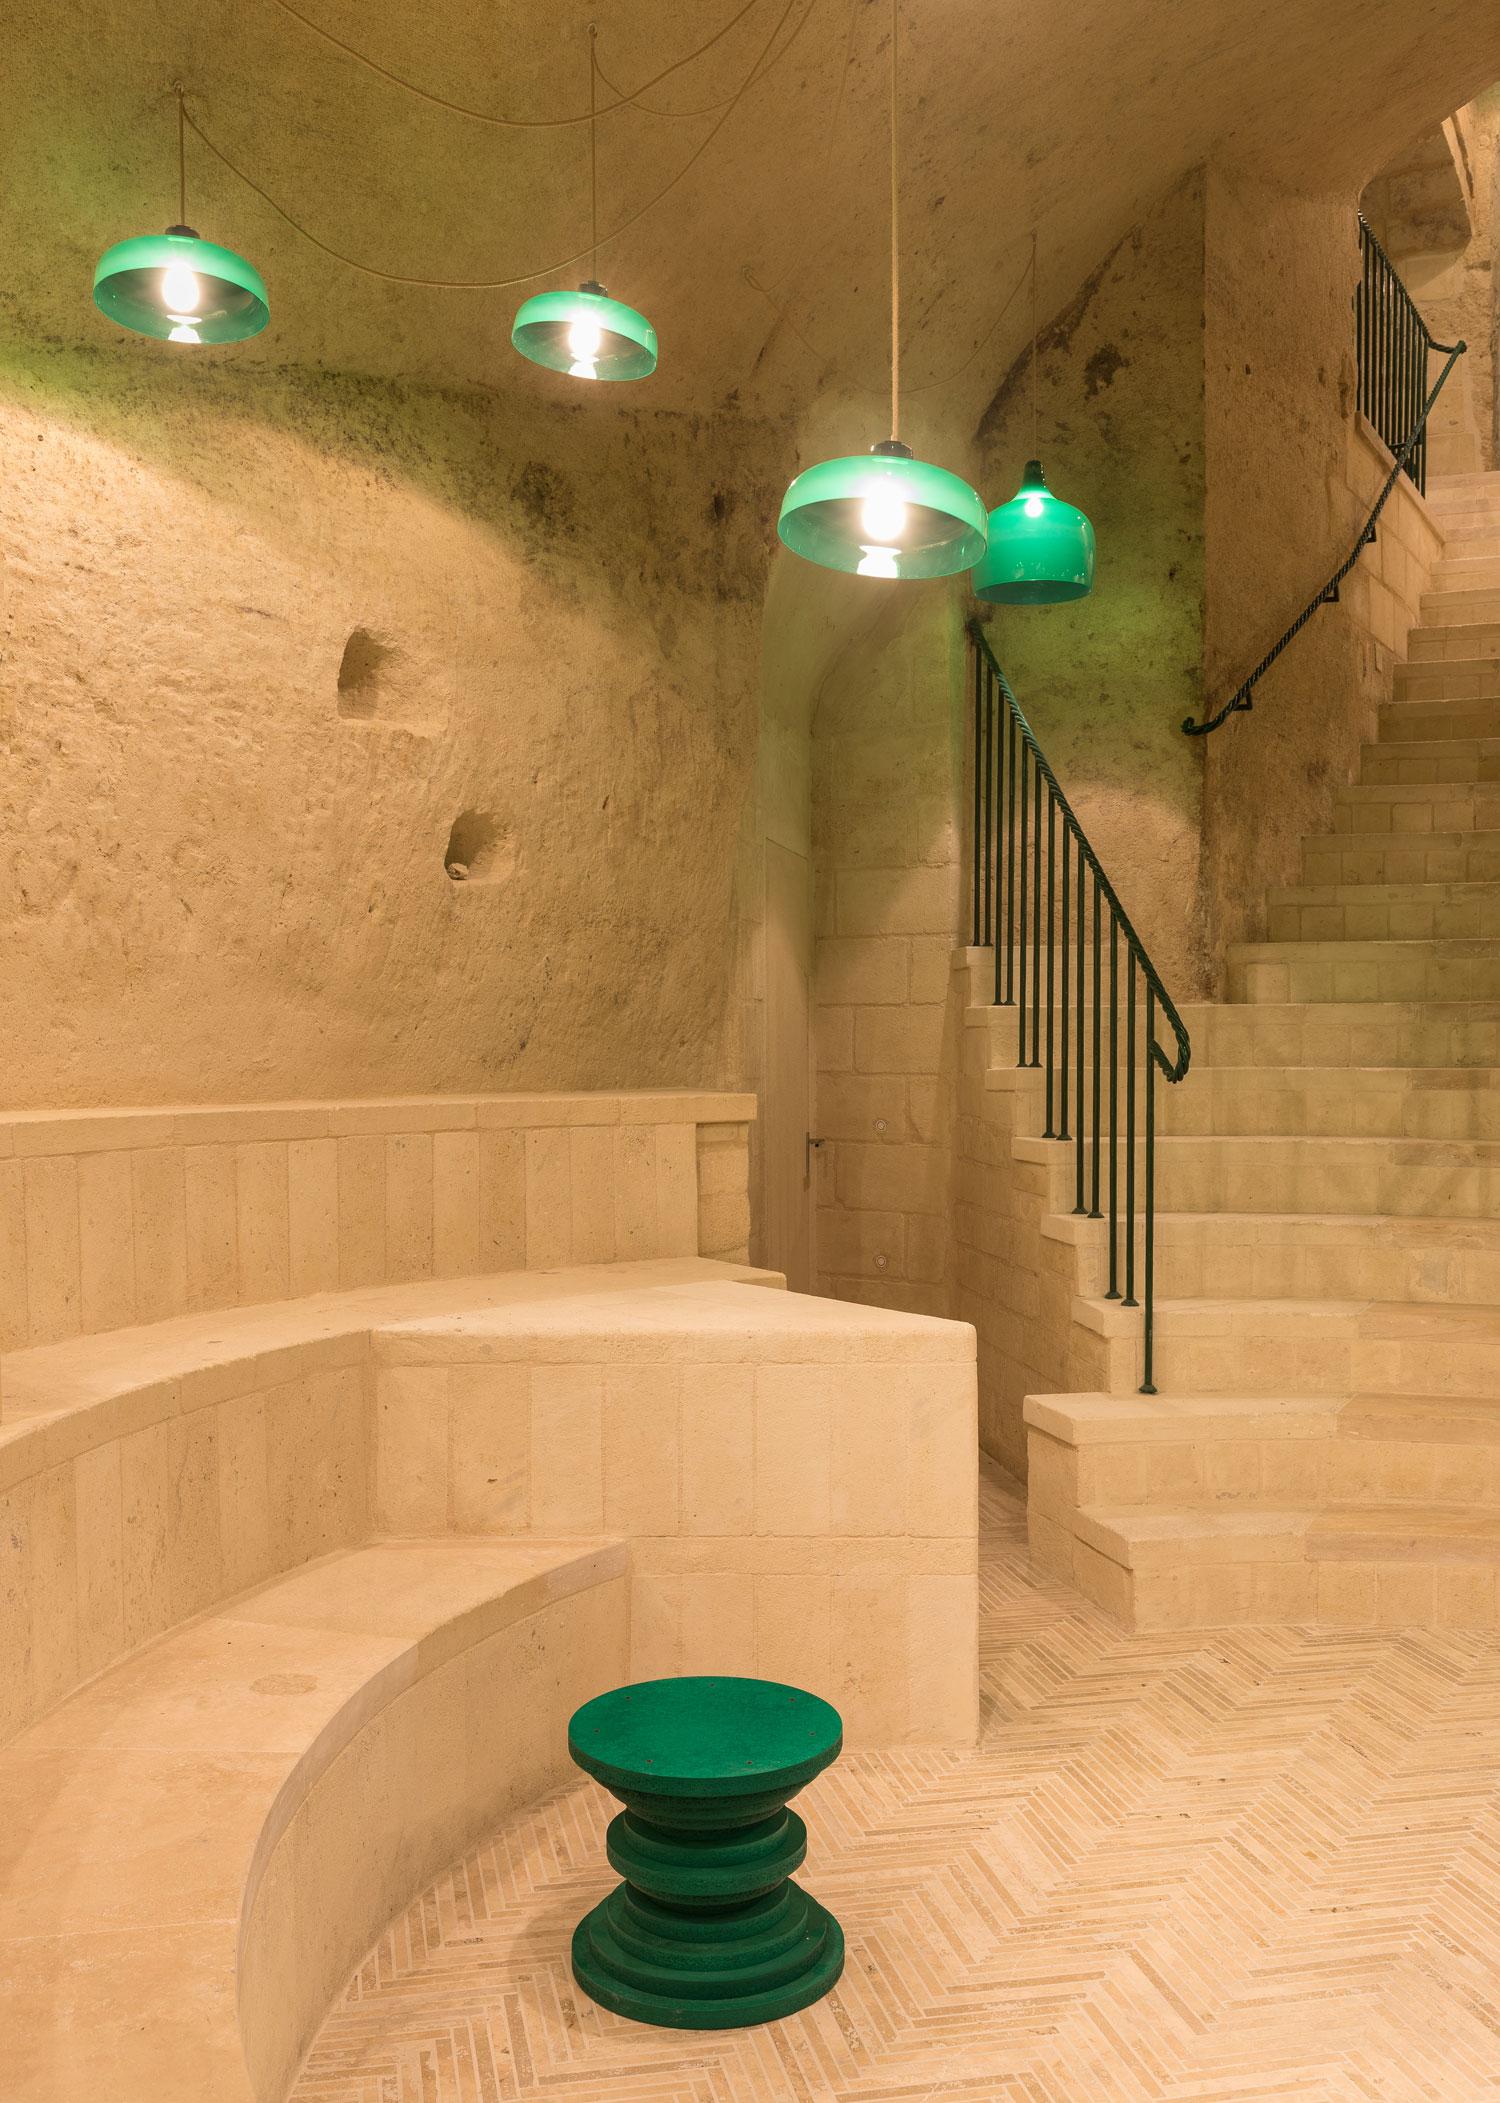 Enoteca-dai-Tosi-Wine-Bar-in-Matera-Italy-by-Architecten-De-Vylder-Vinck-Taillieu-cafeveyafe (5)